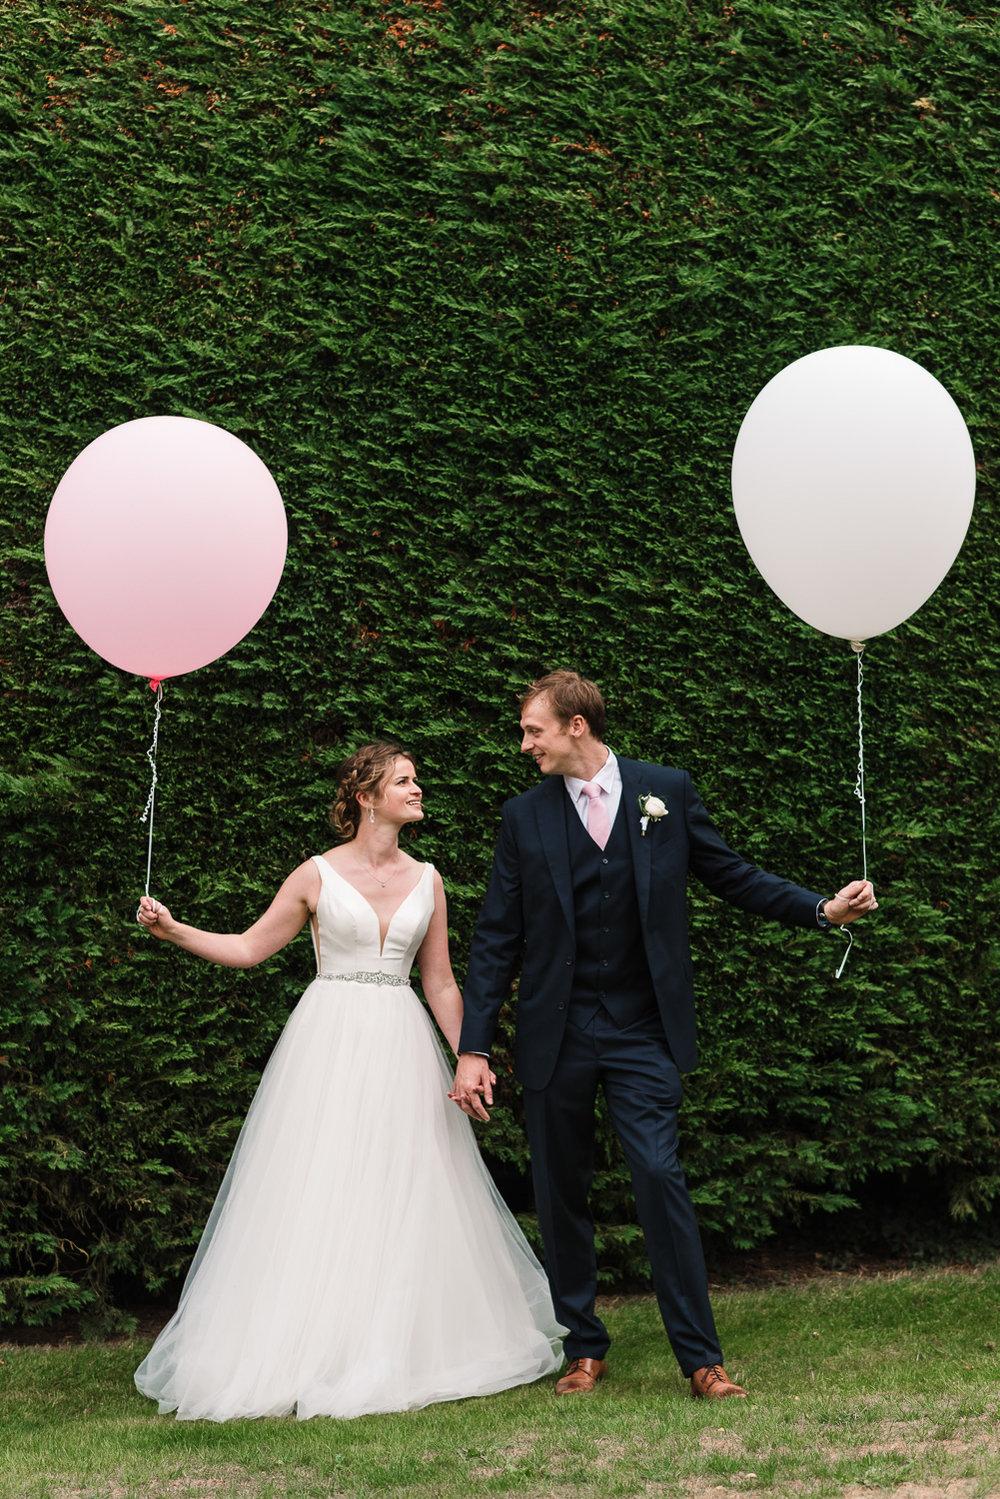 frensham-wedding-photographer-48.jpg